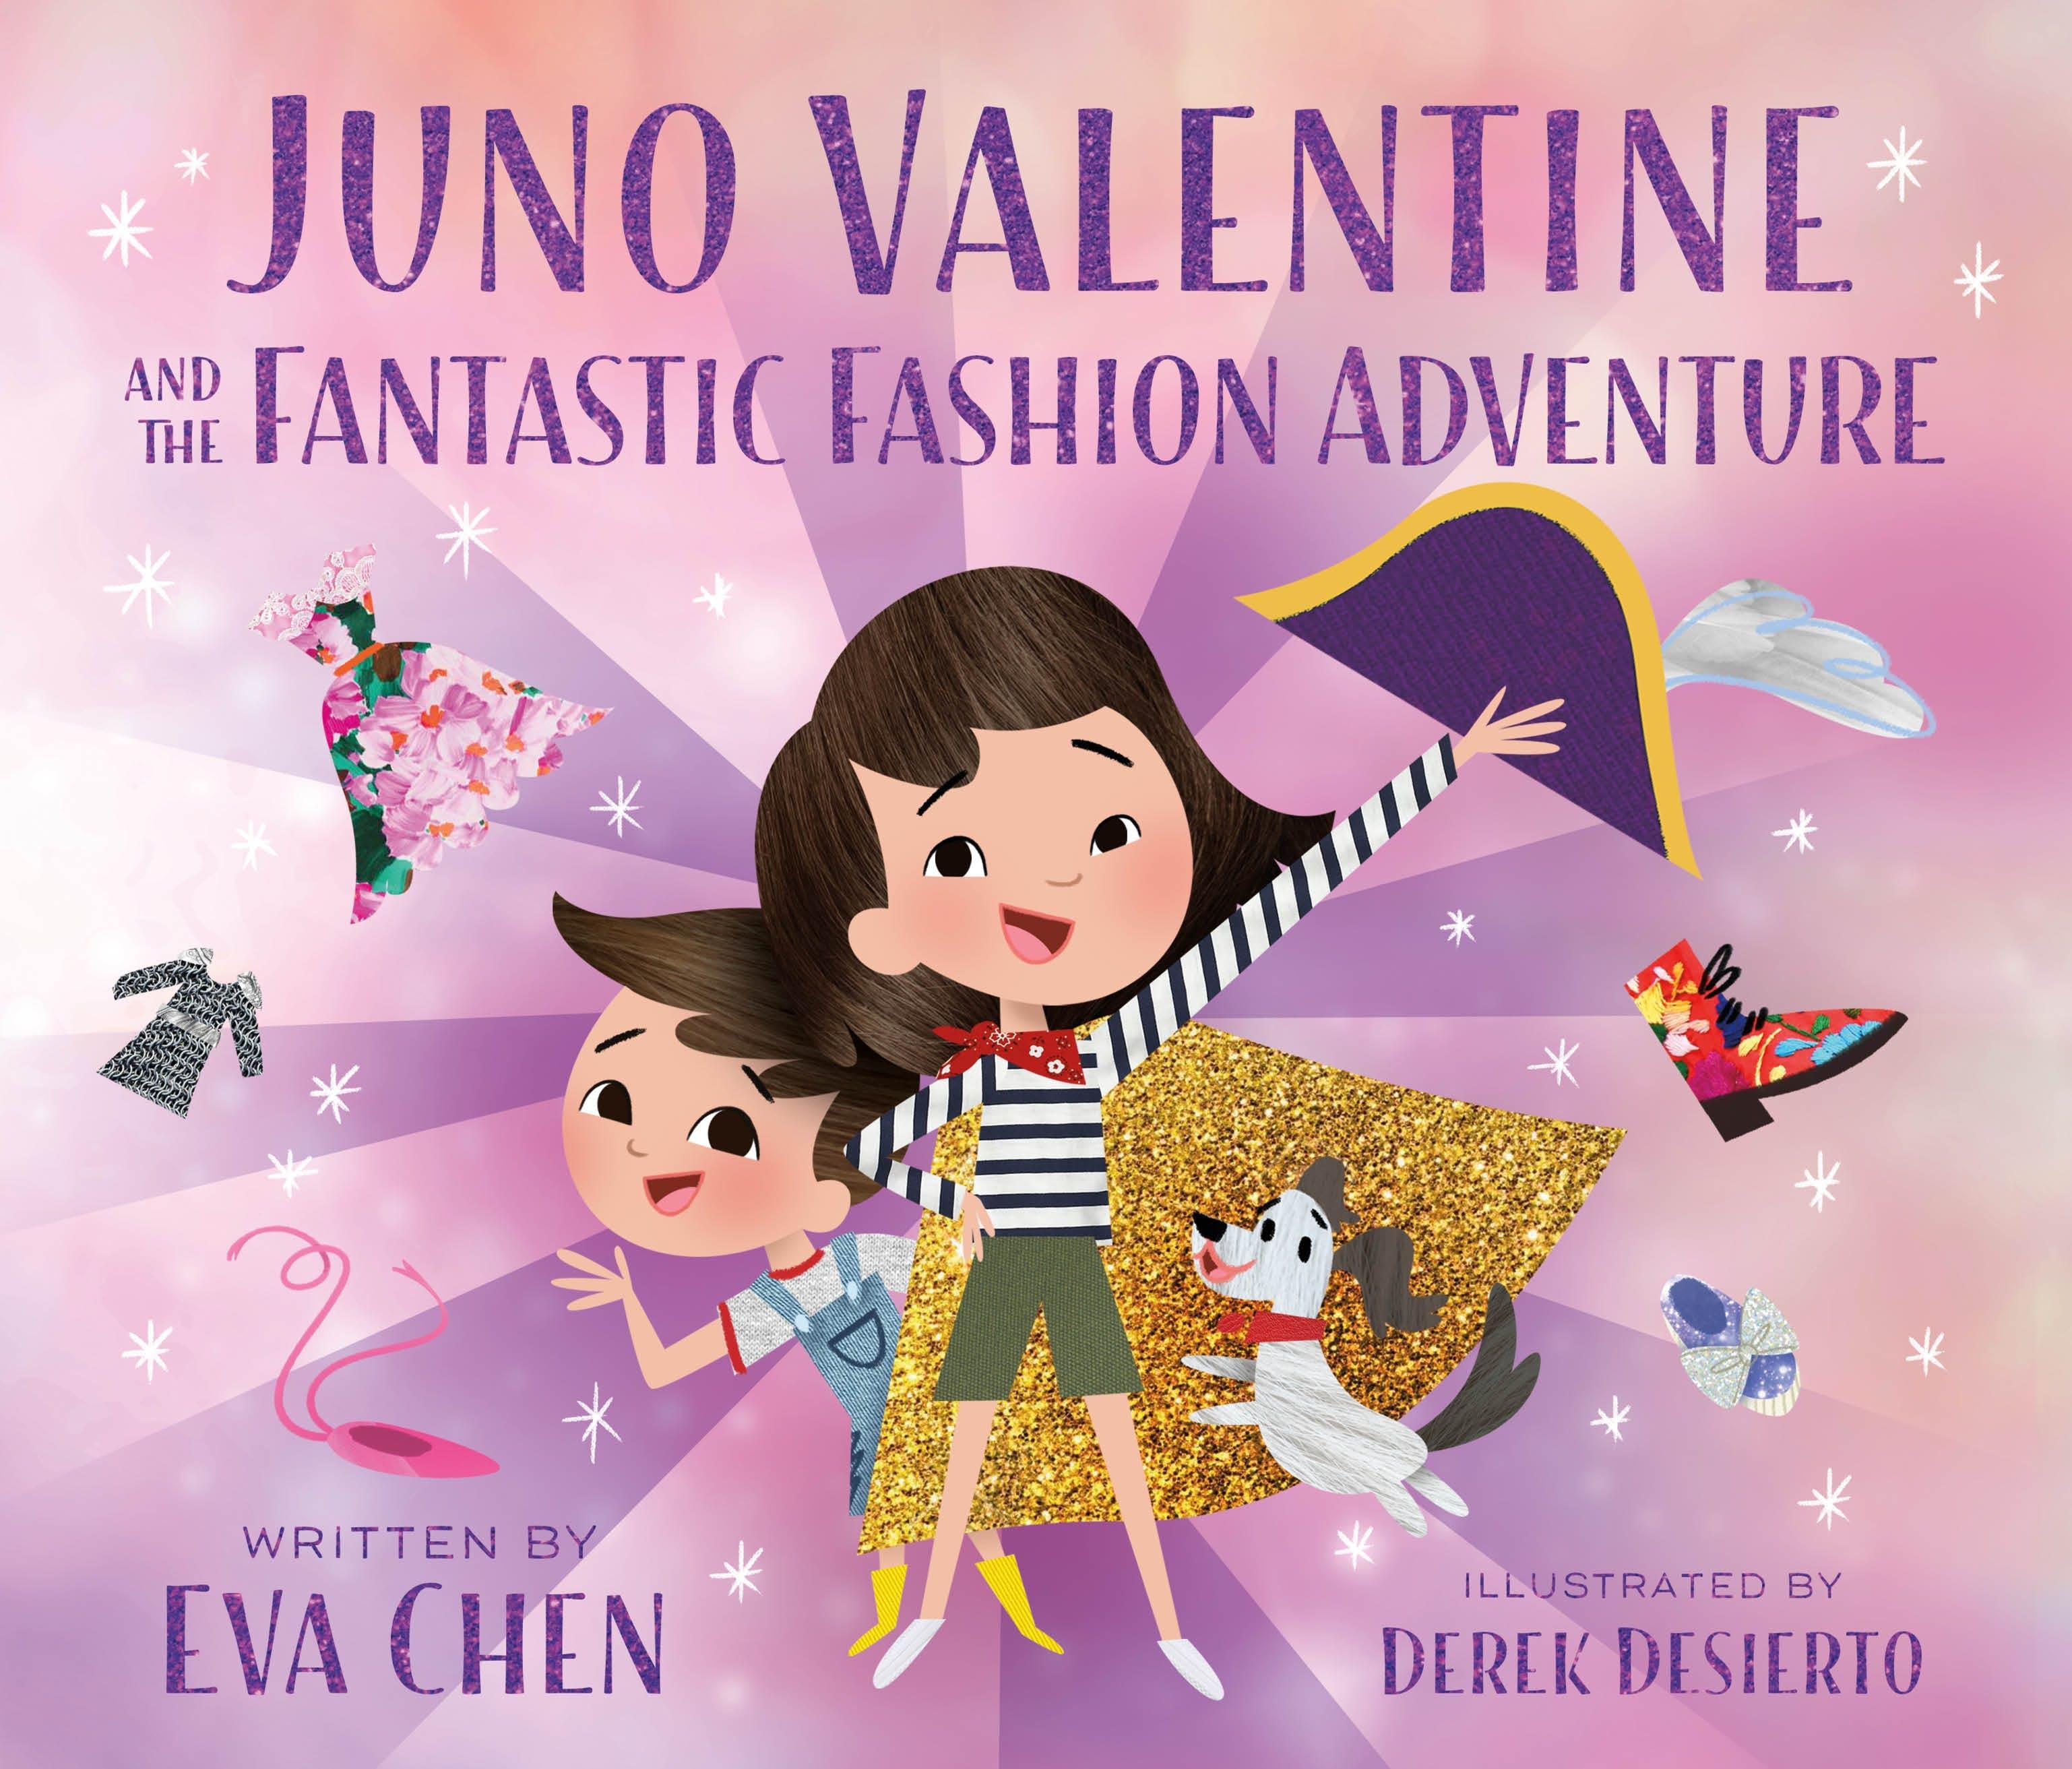 Image of Juno Valentine and the Fantastic Fashion Adventure